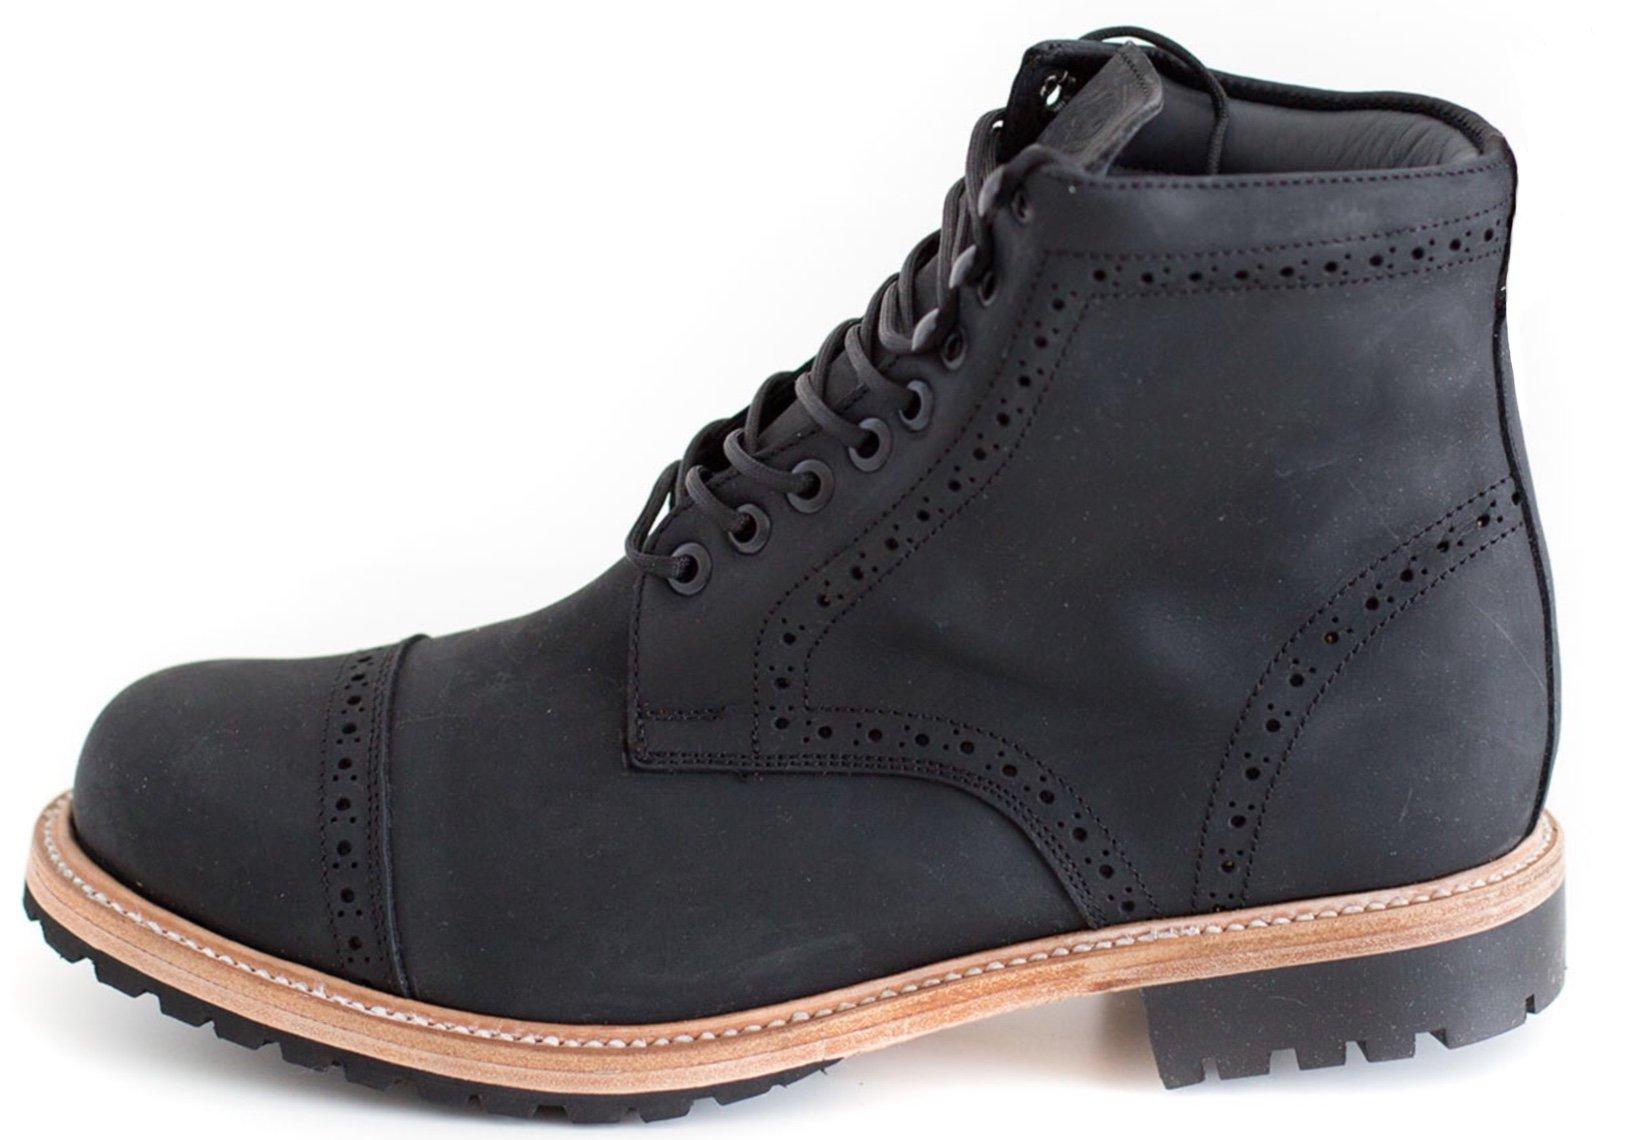 Wilcox Boots | Classic Style + Premium Comfort Fairfax Matte Black-11